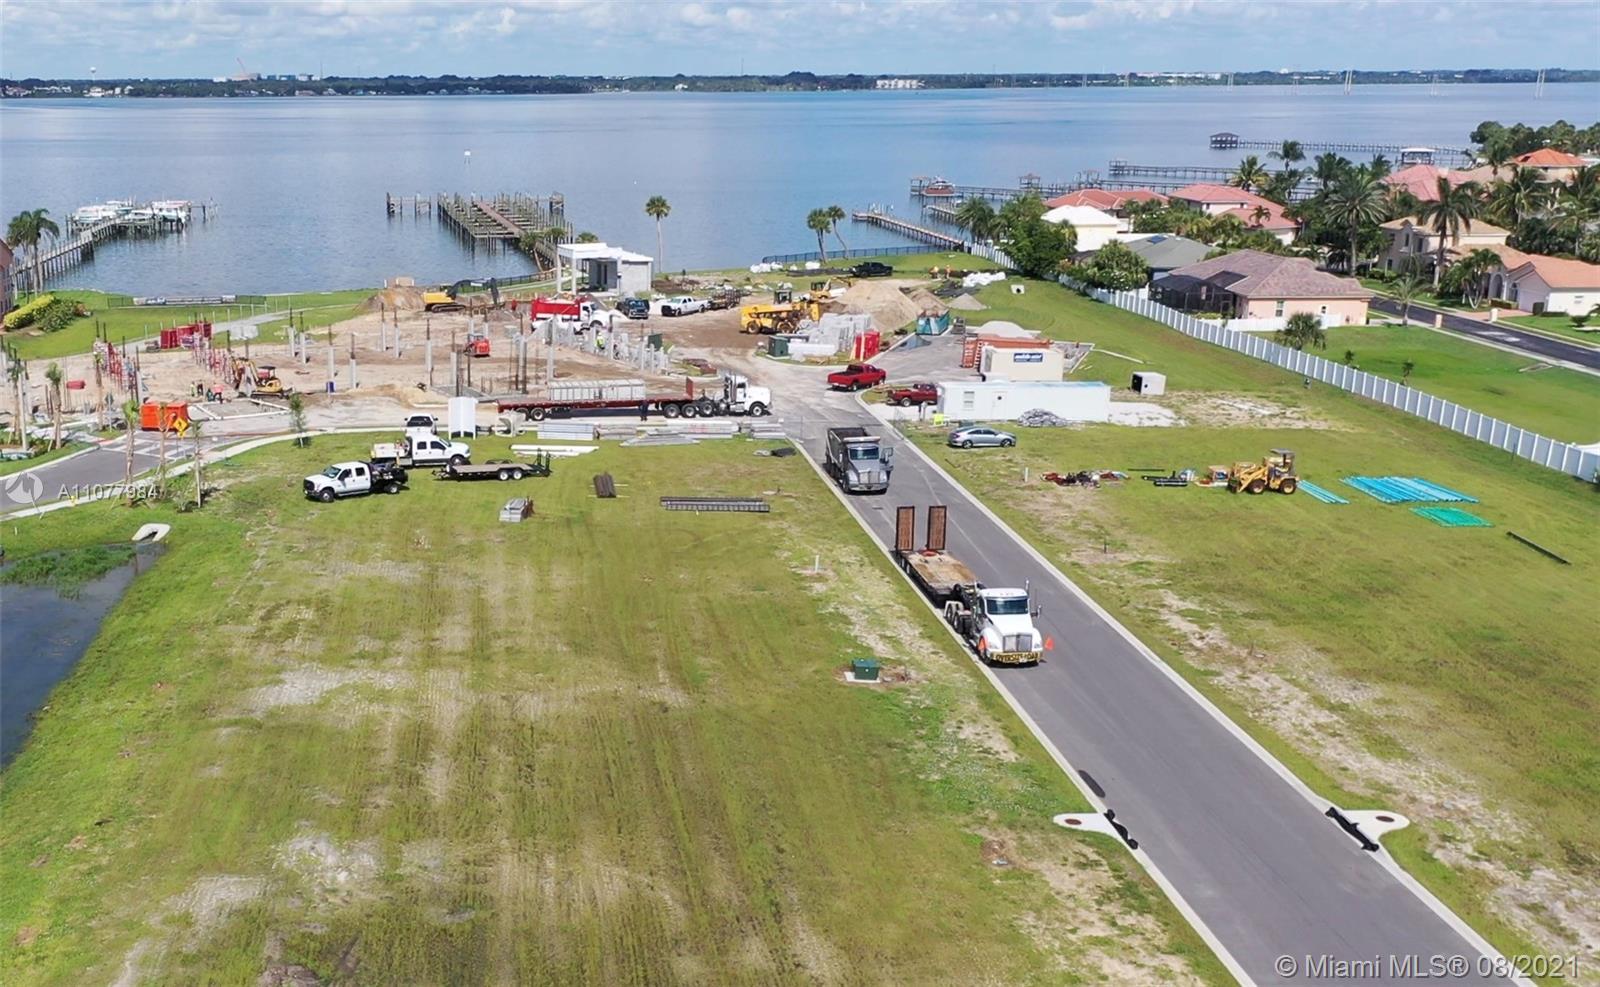 Photo of Harbor Island Beach Club Apt 301